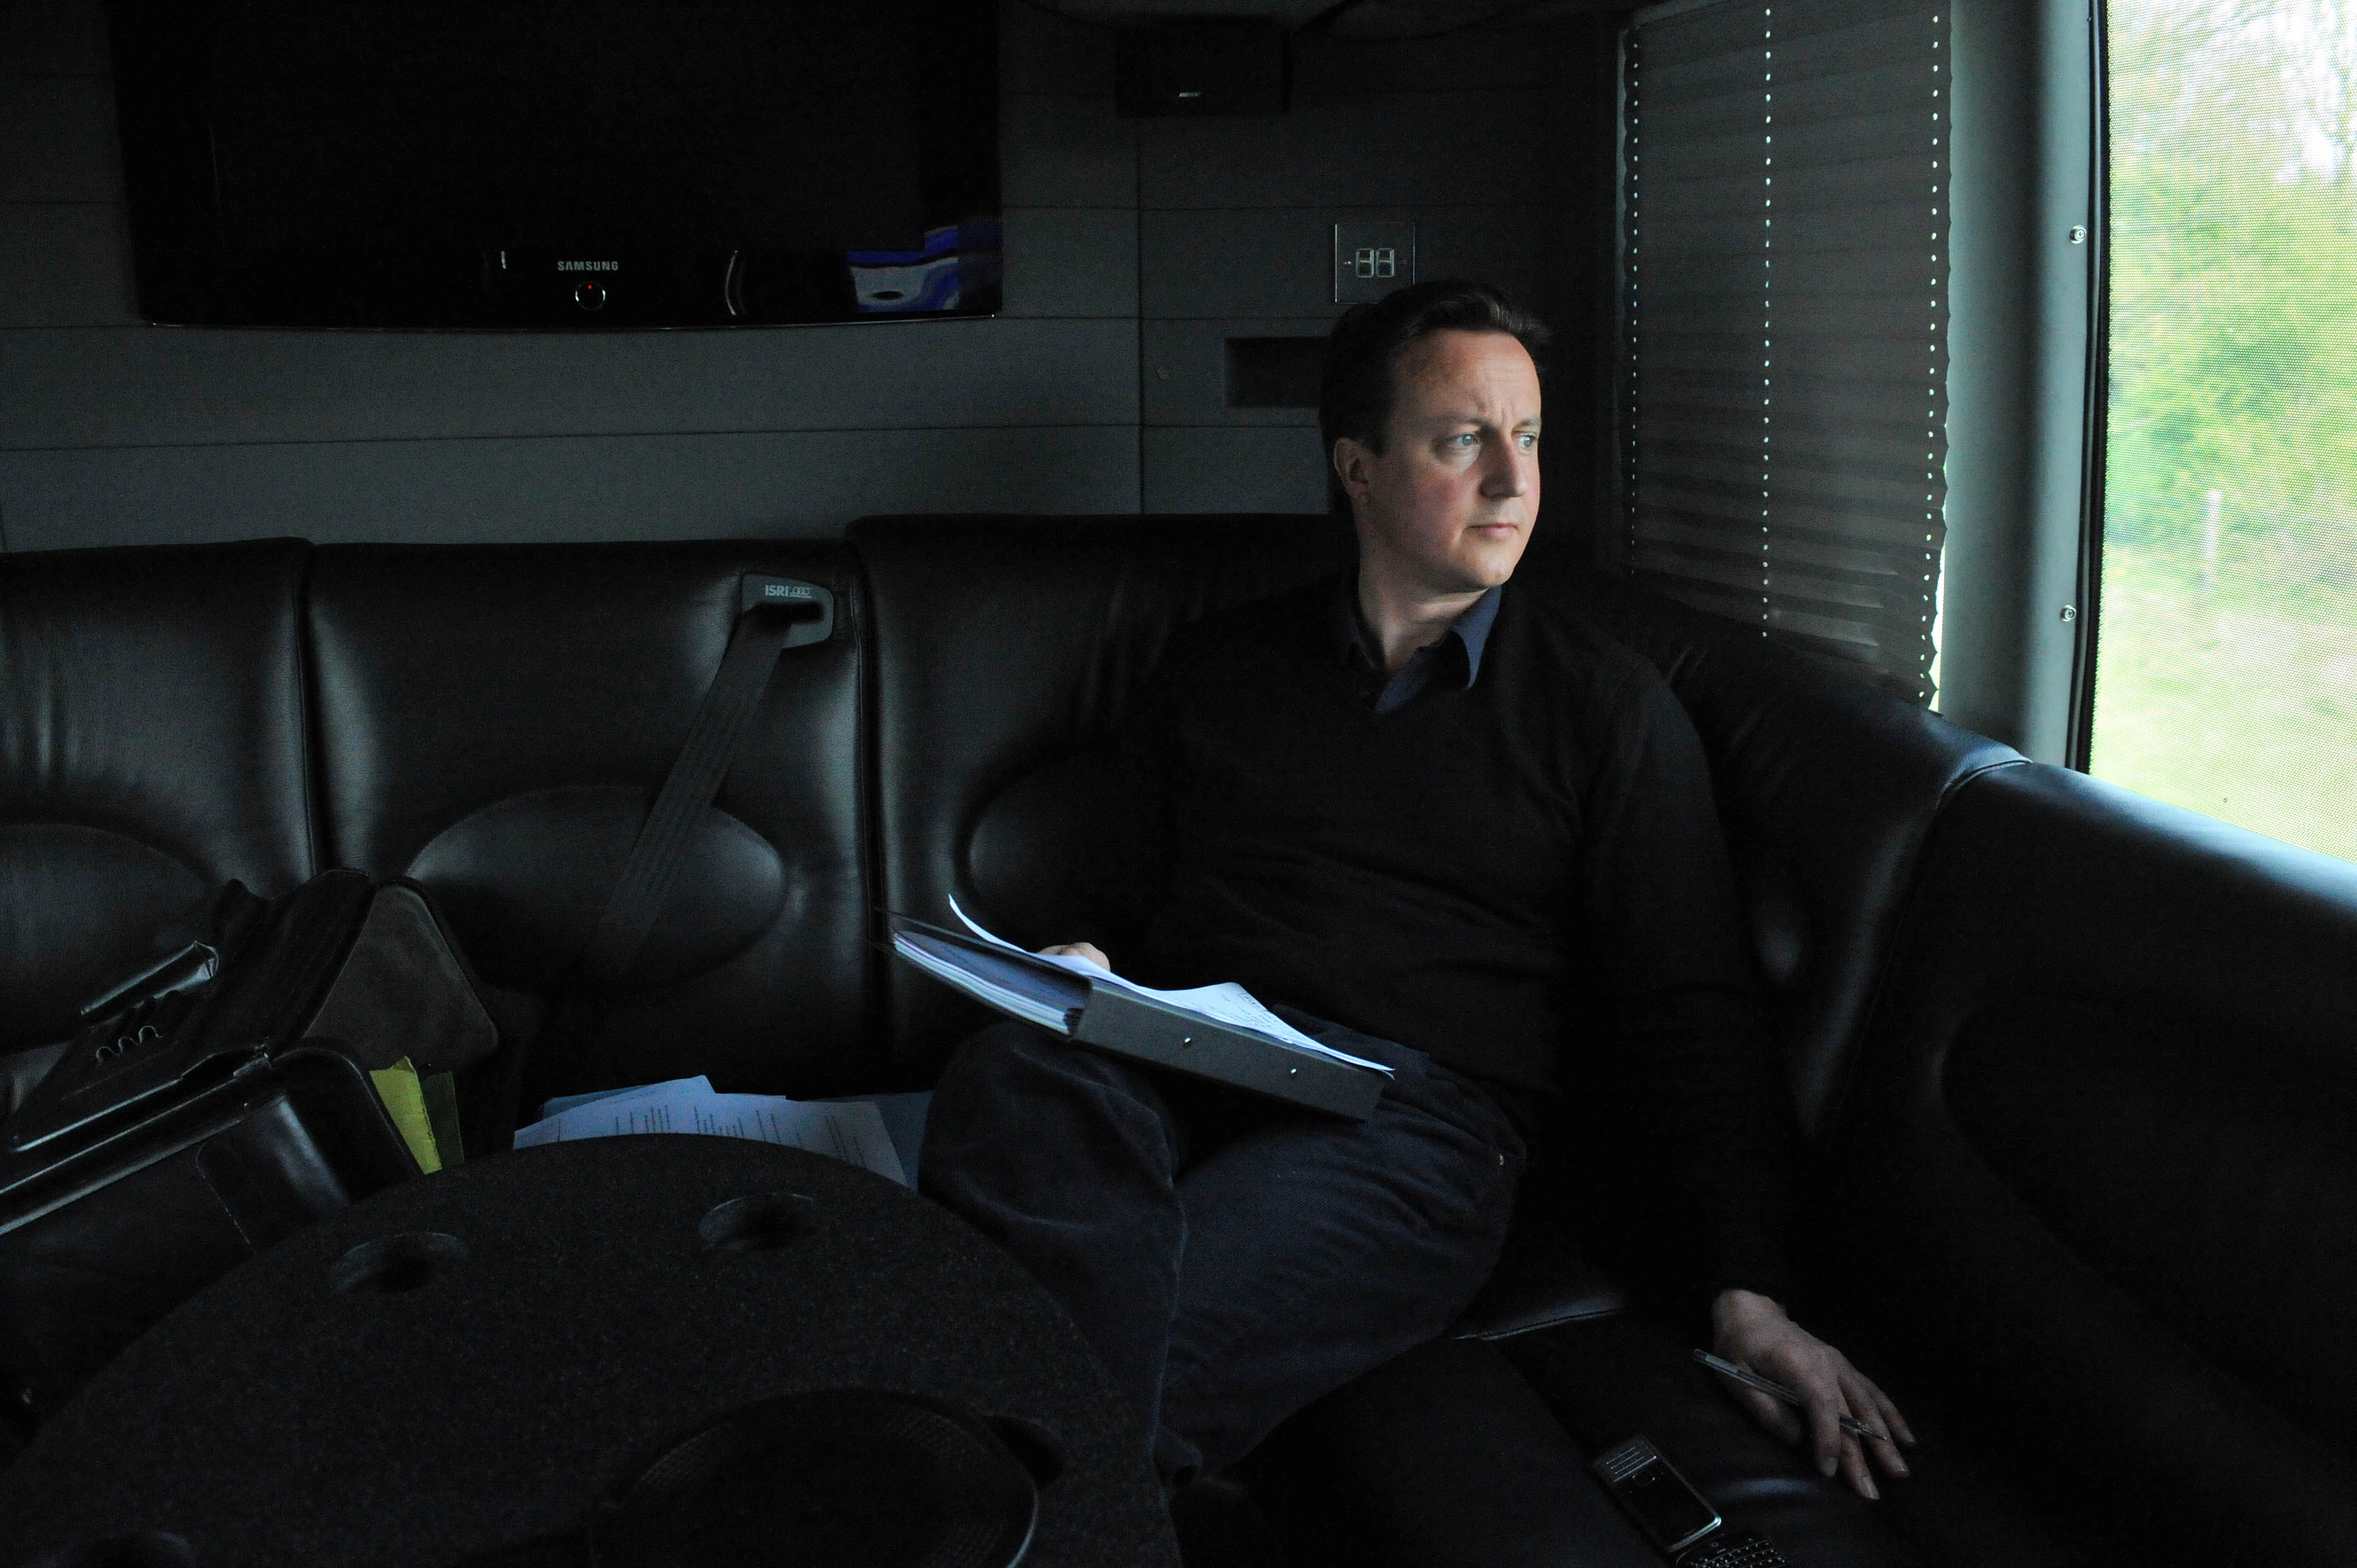 David Cameron Campaign